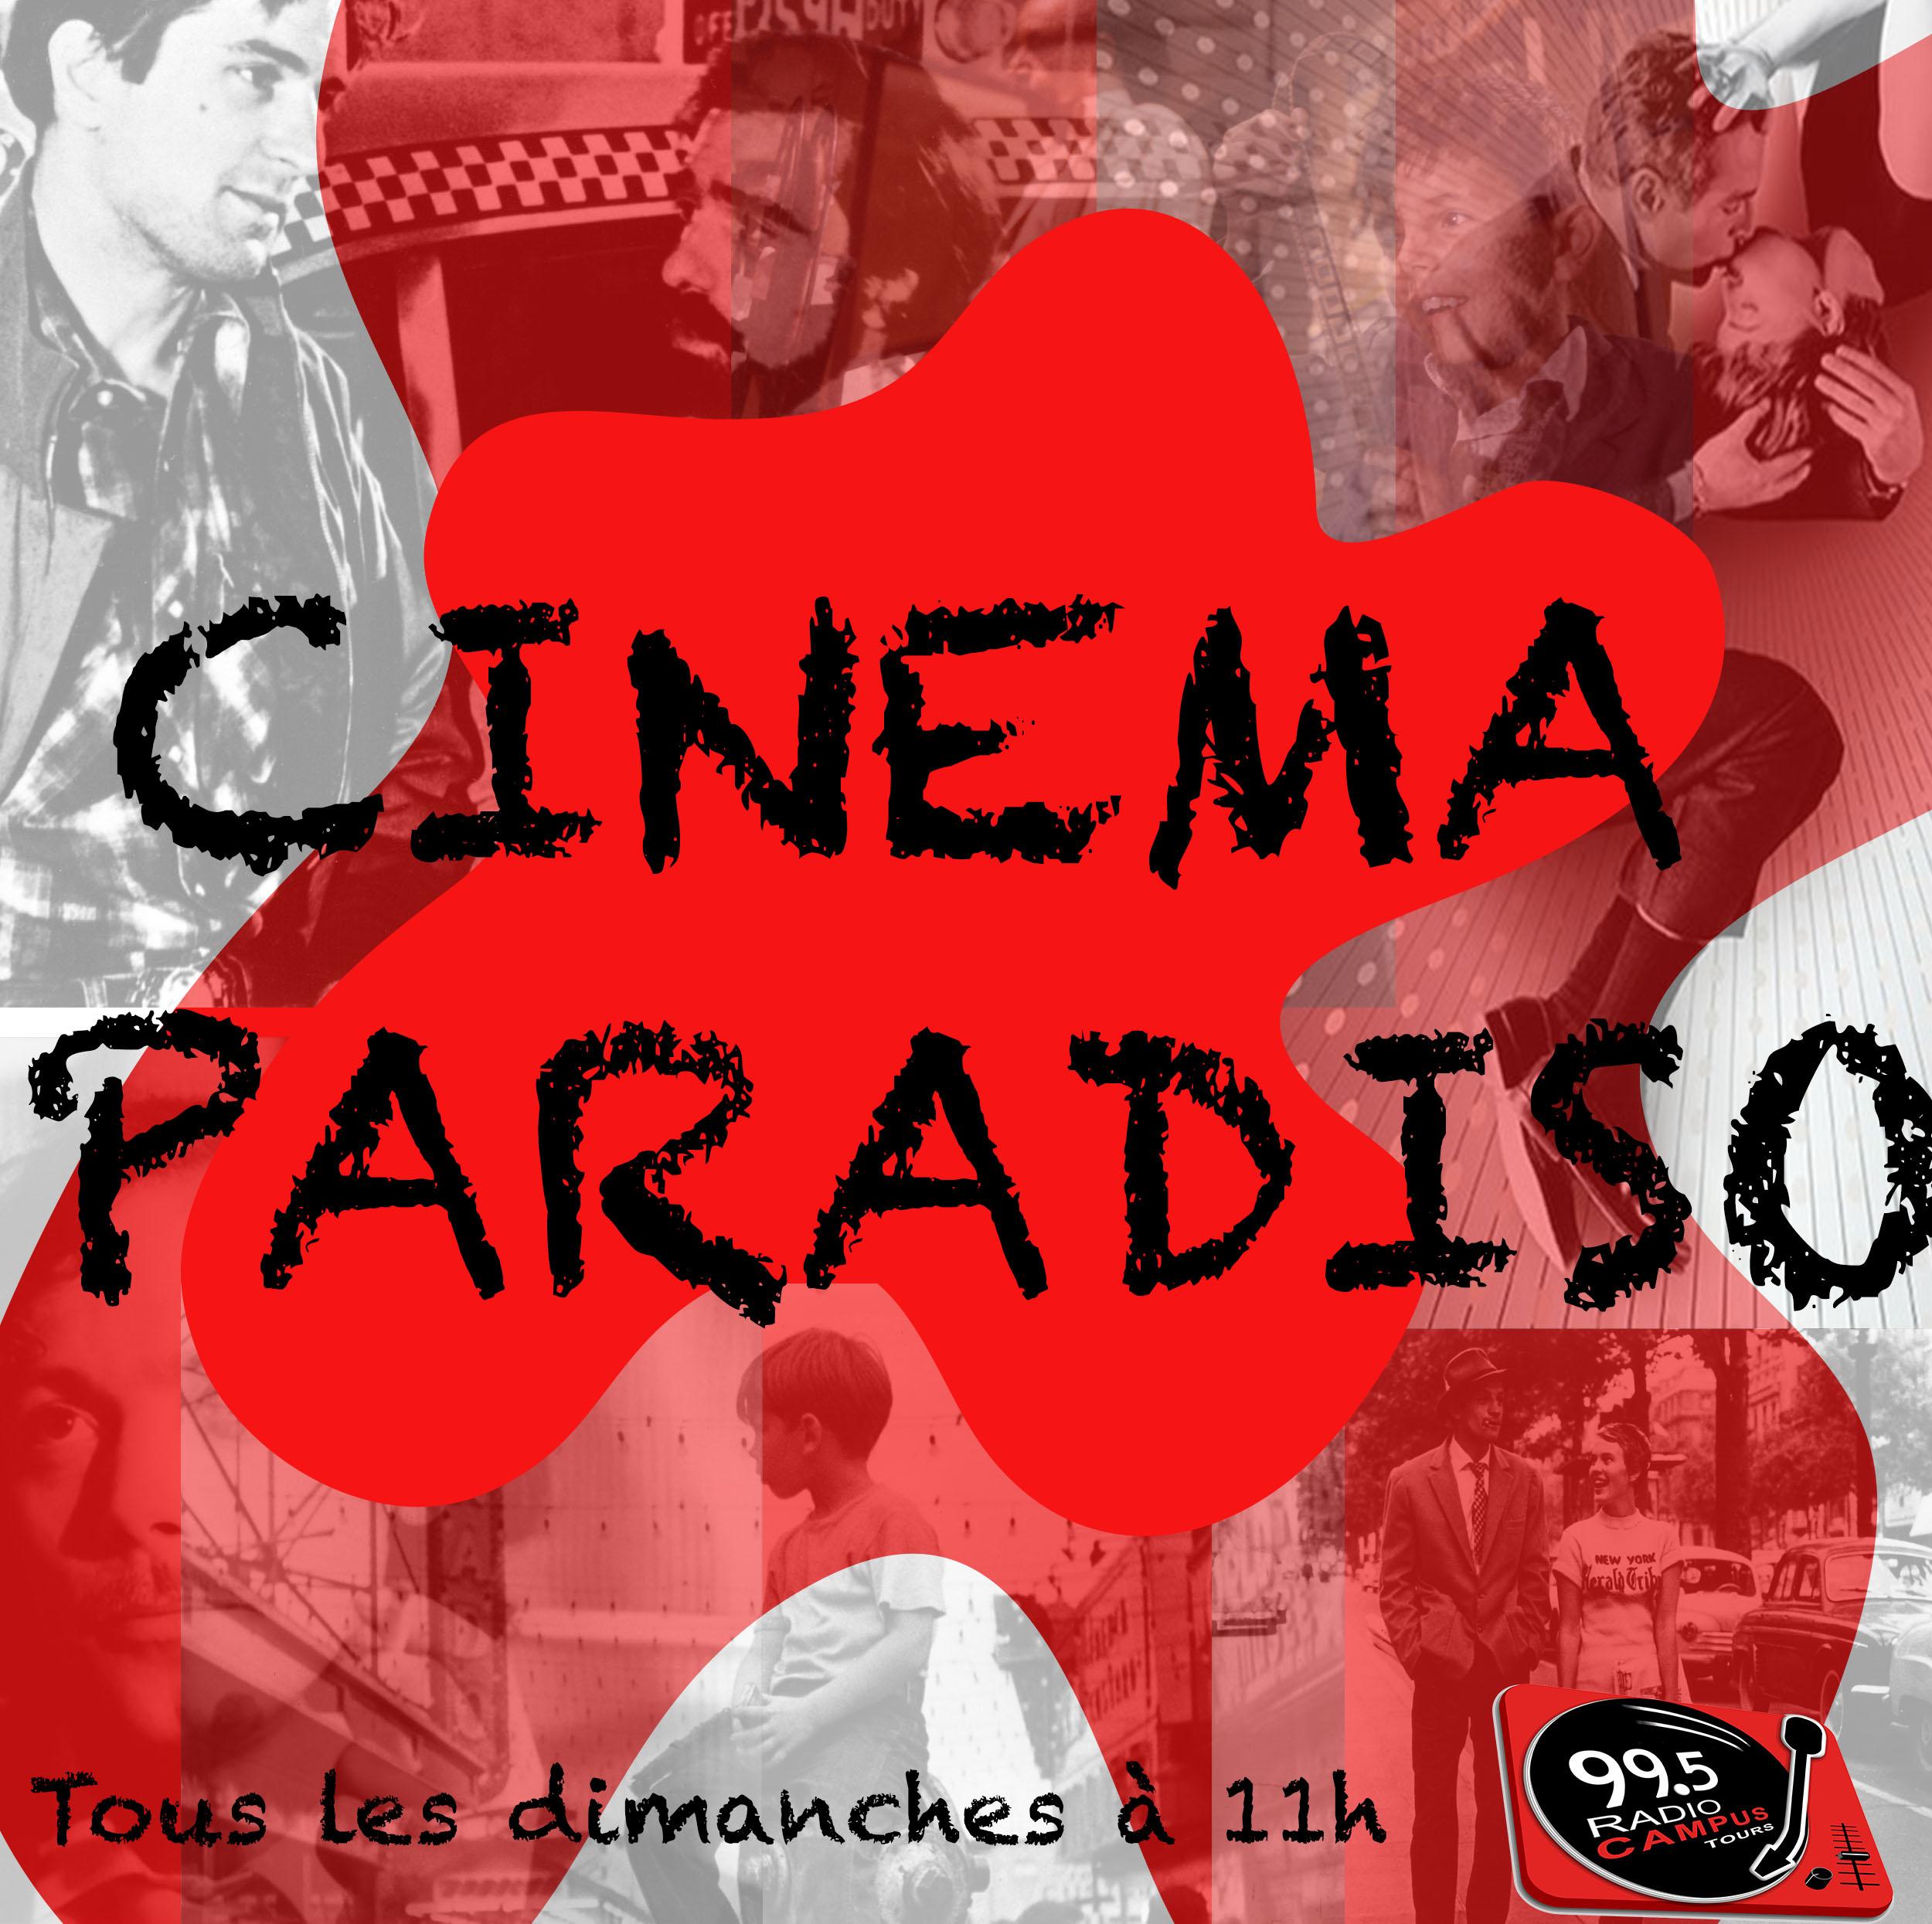 https://www.radiocampustours.com/wp-content/uploads/2014/04/cin%C3%A9ma-paradiso.jpg